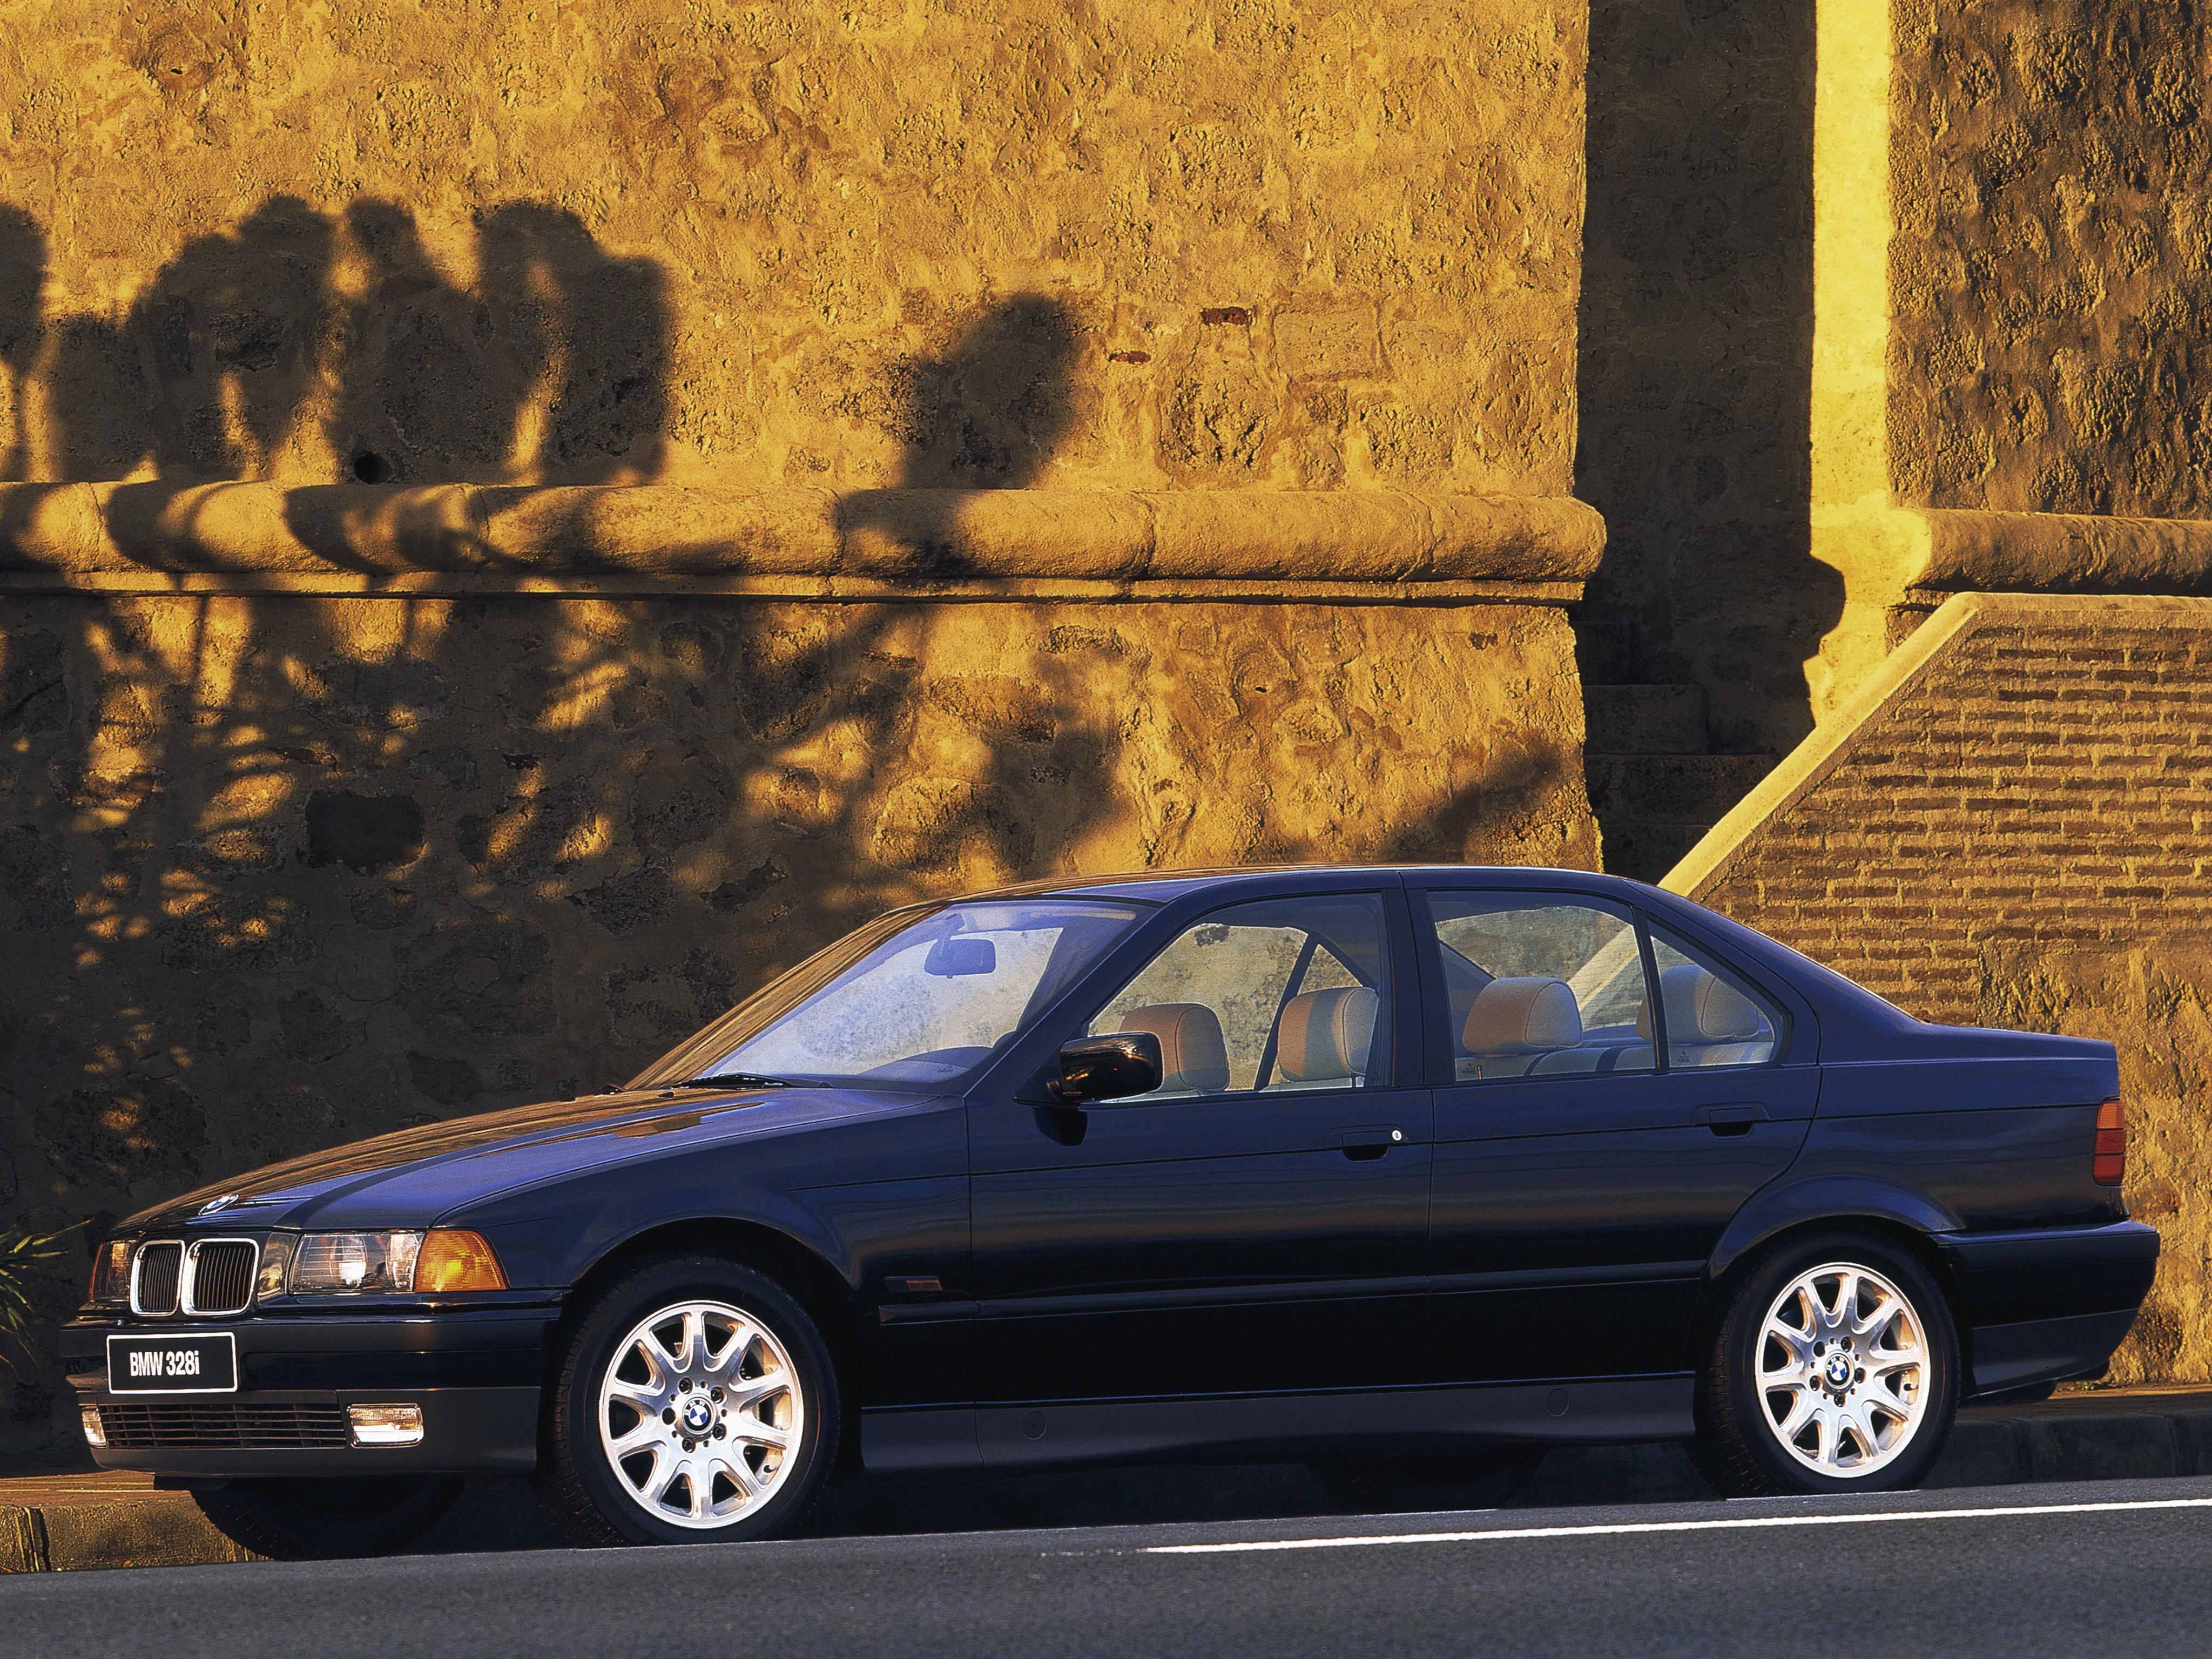 BMW 3 Series Sedan (E36) - 1991, 1992, 1993, 1994, 1995 ...